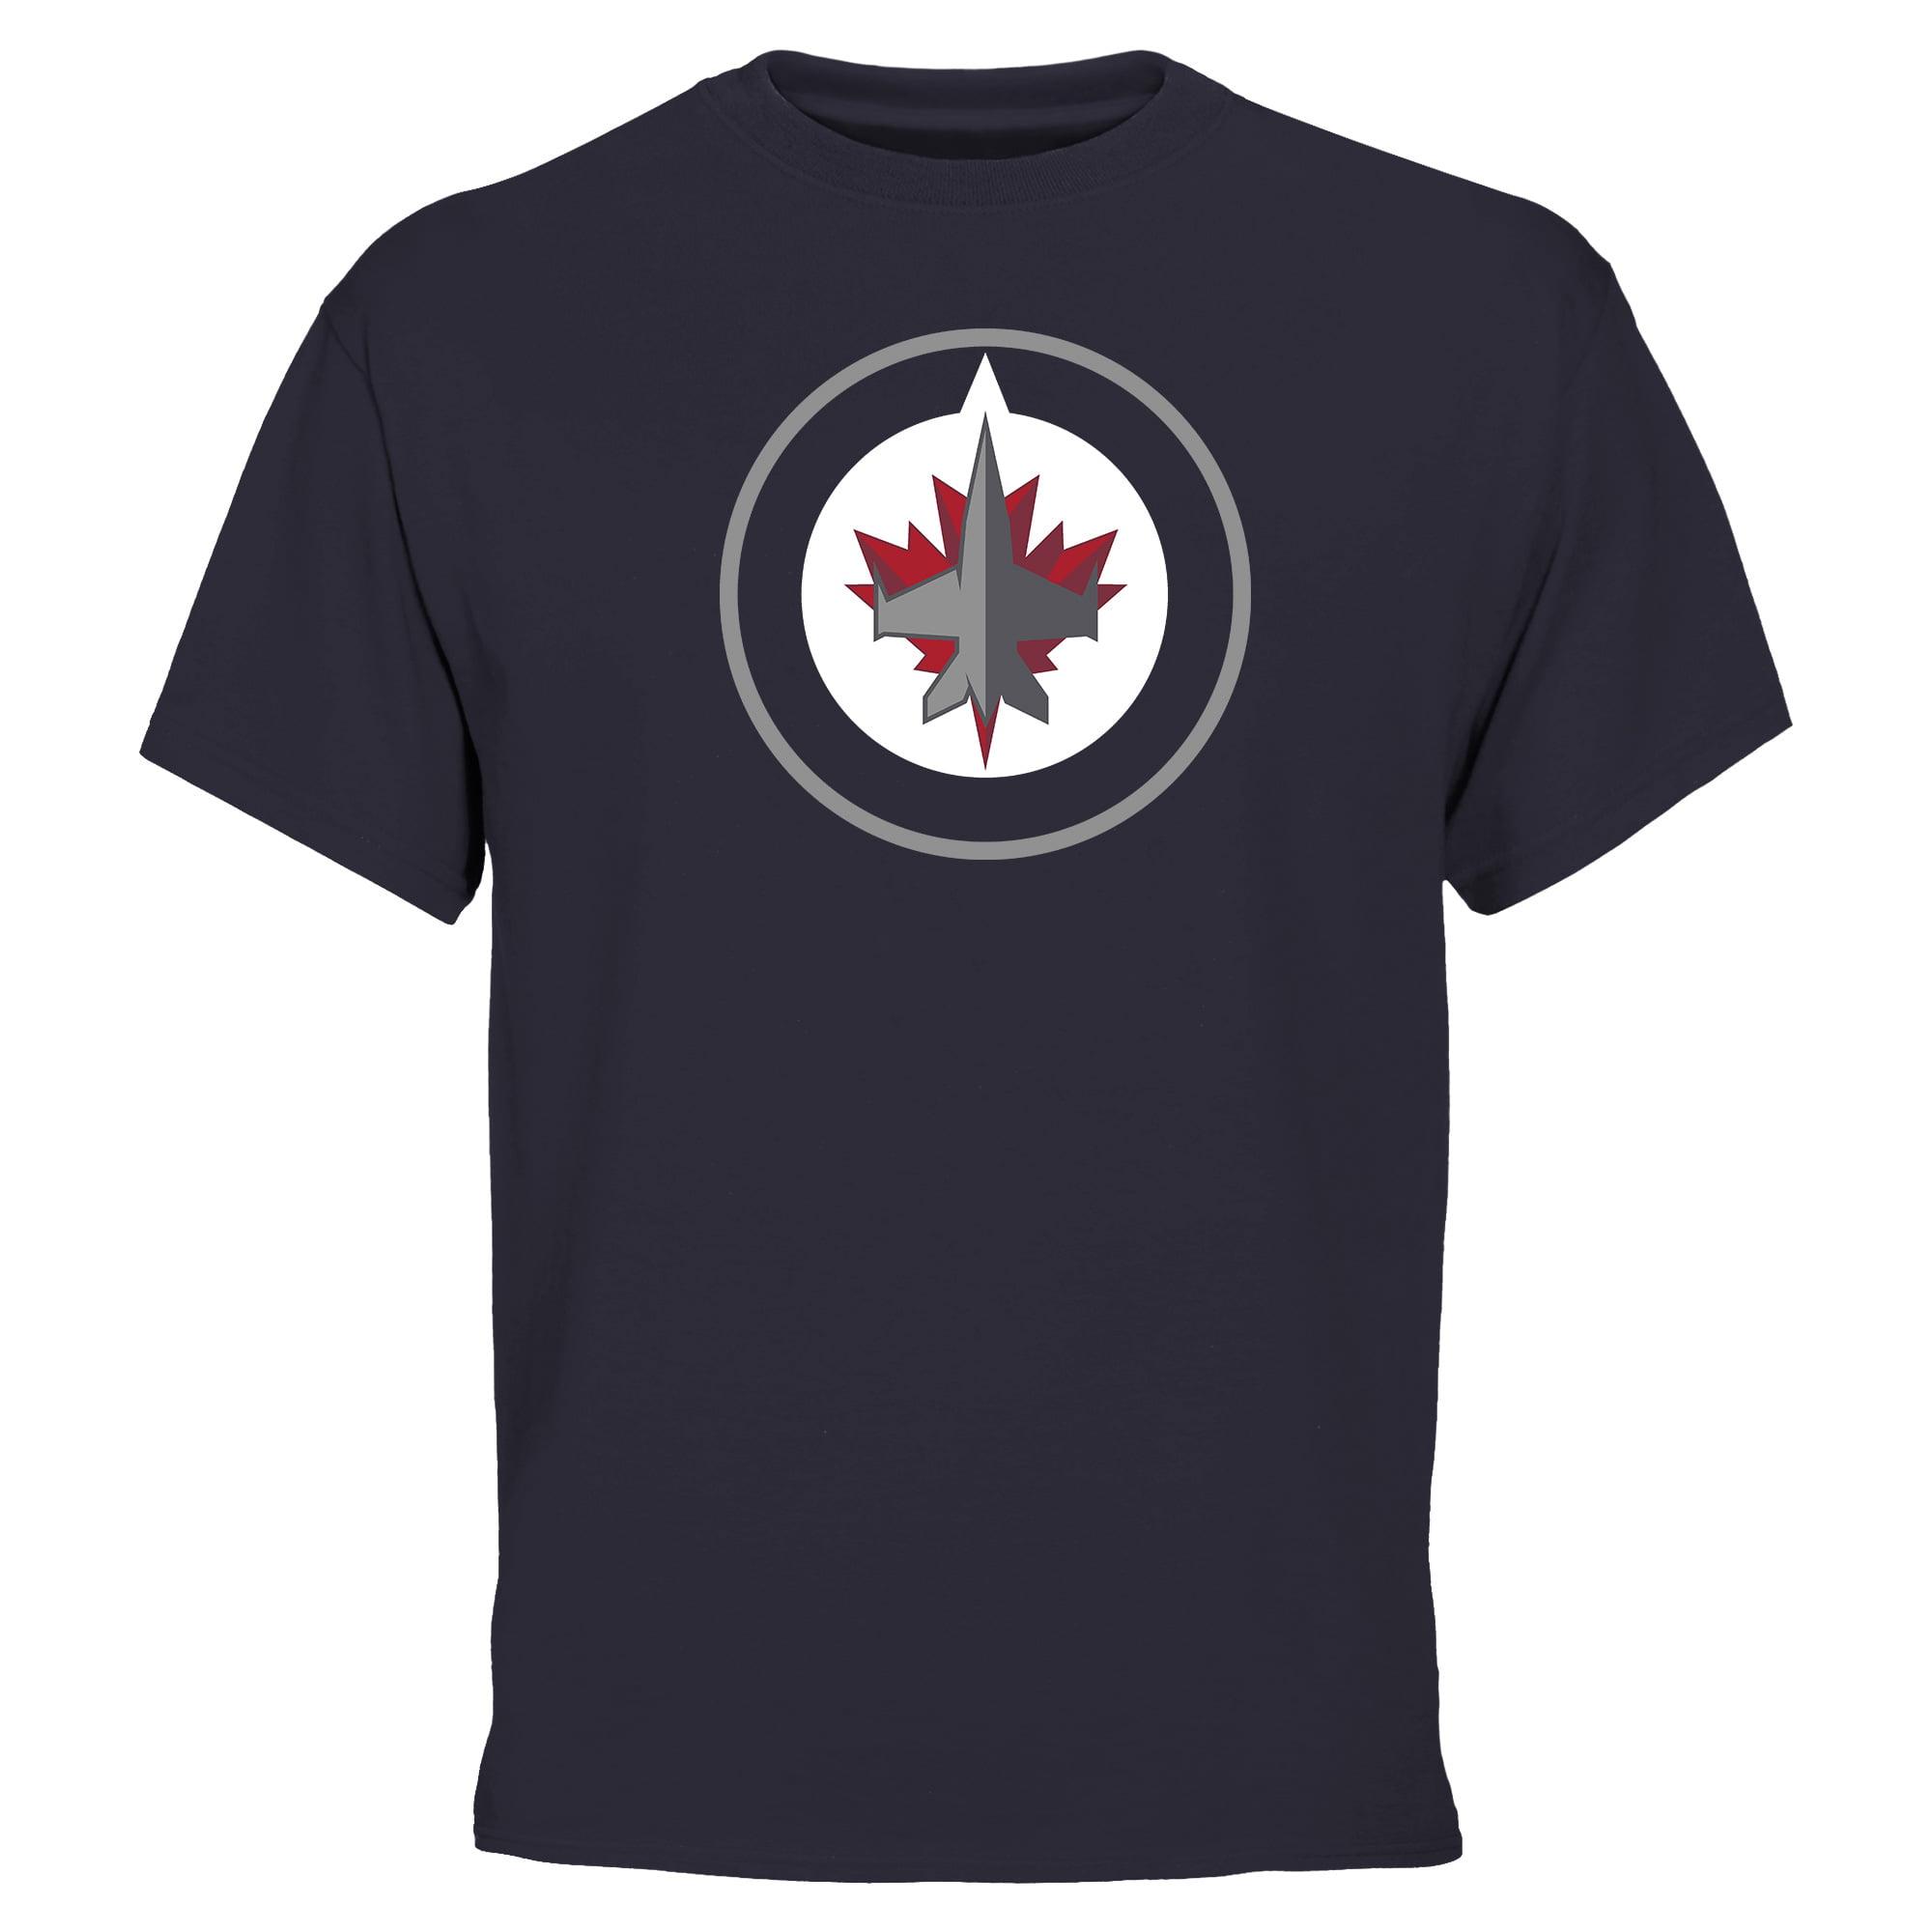 Winnipeg Jets Fan Big Logo T-Shirt - Navy